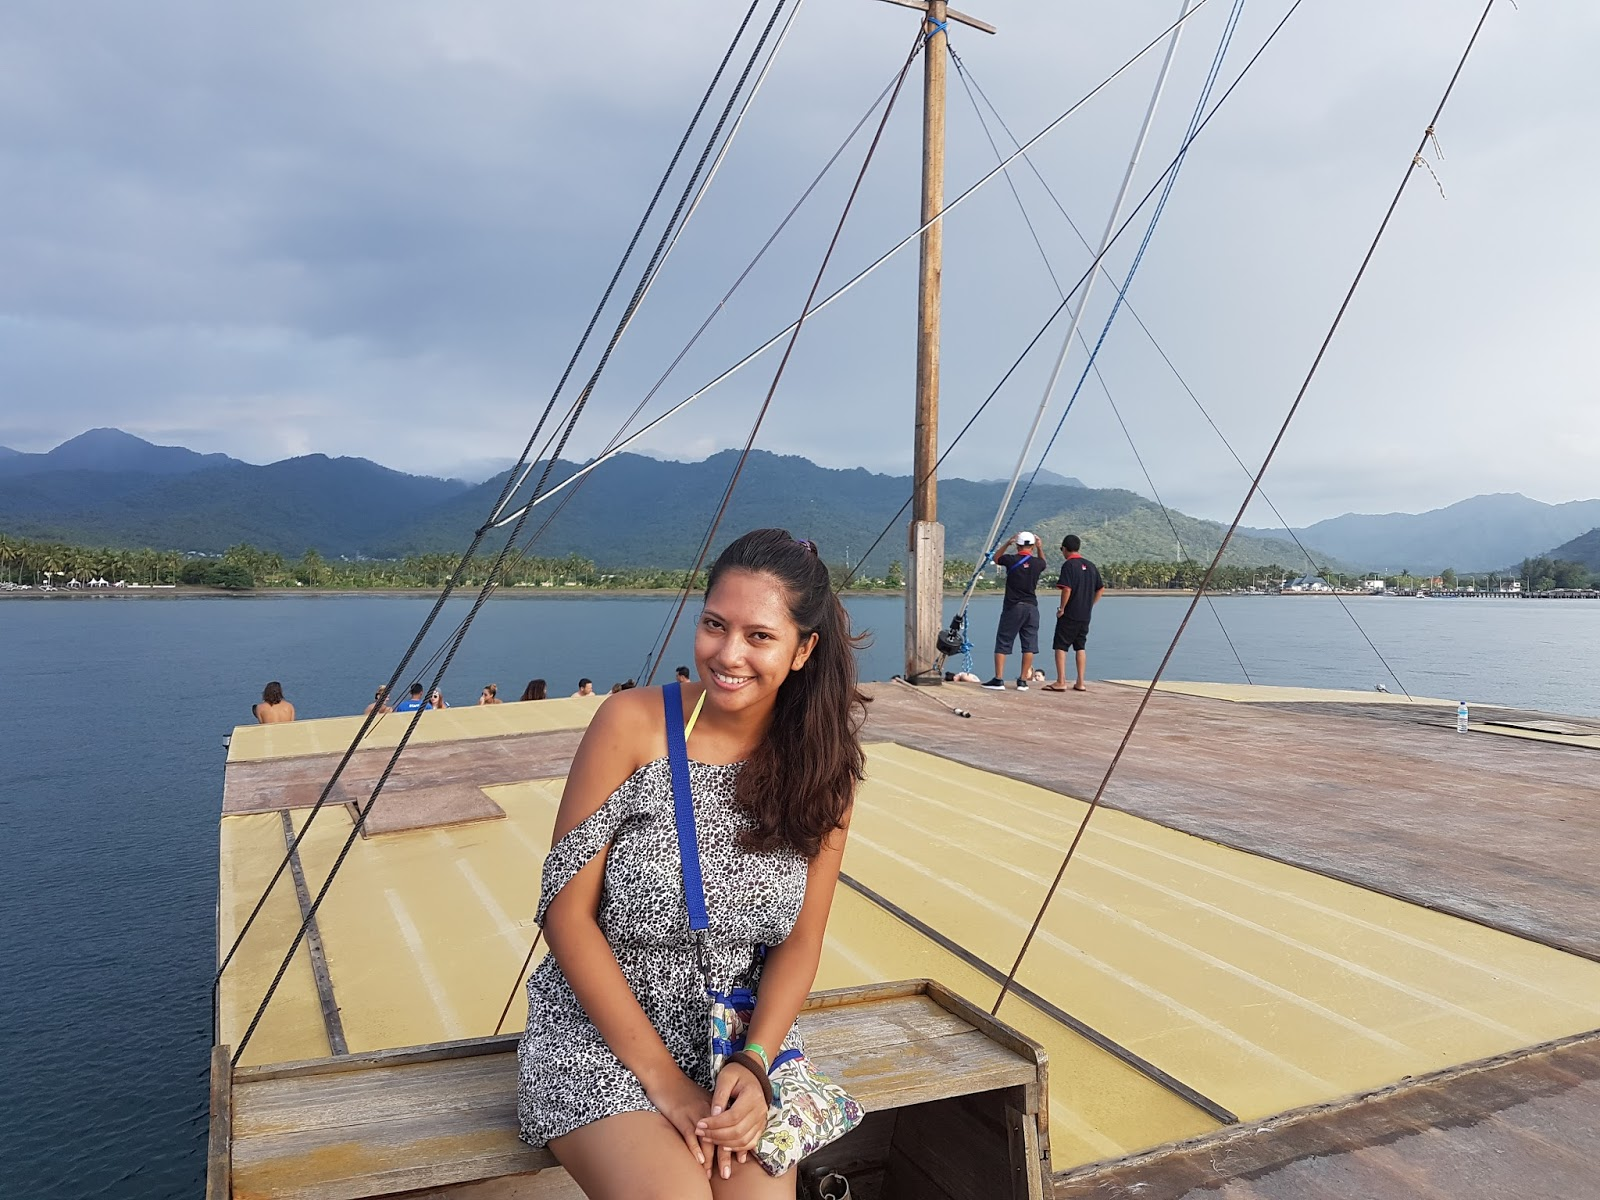 Jiggy Boat Party Gili Trawangan Review | Ummi Goes Where?